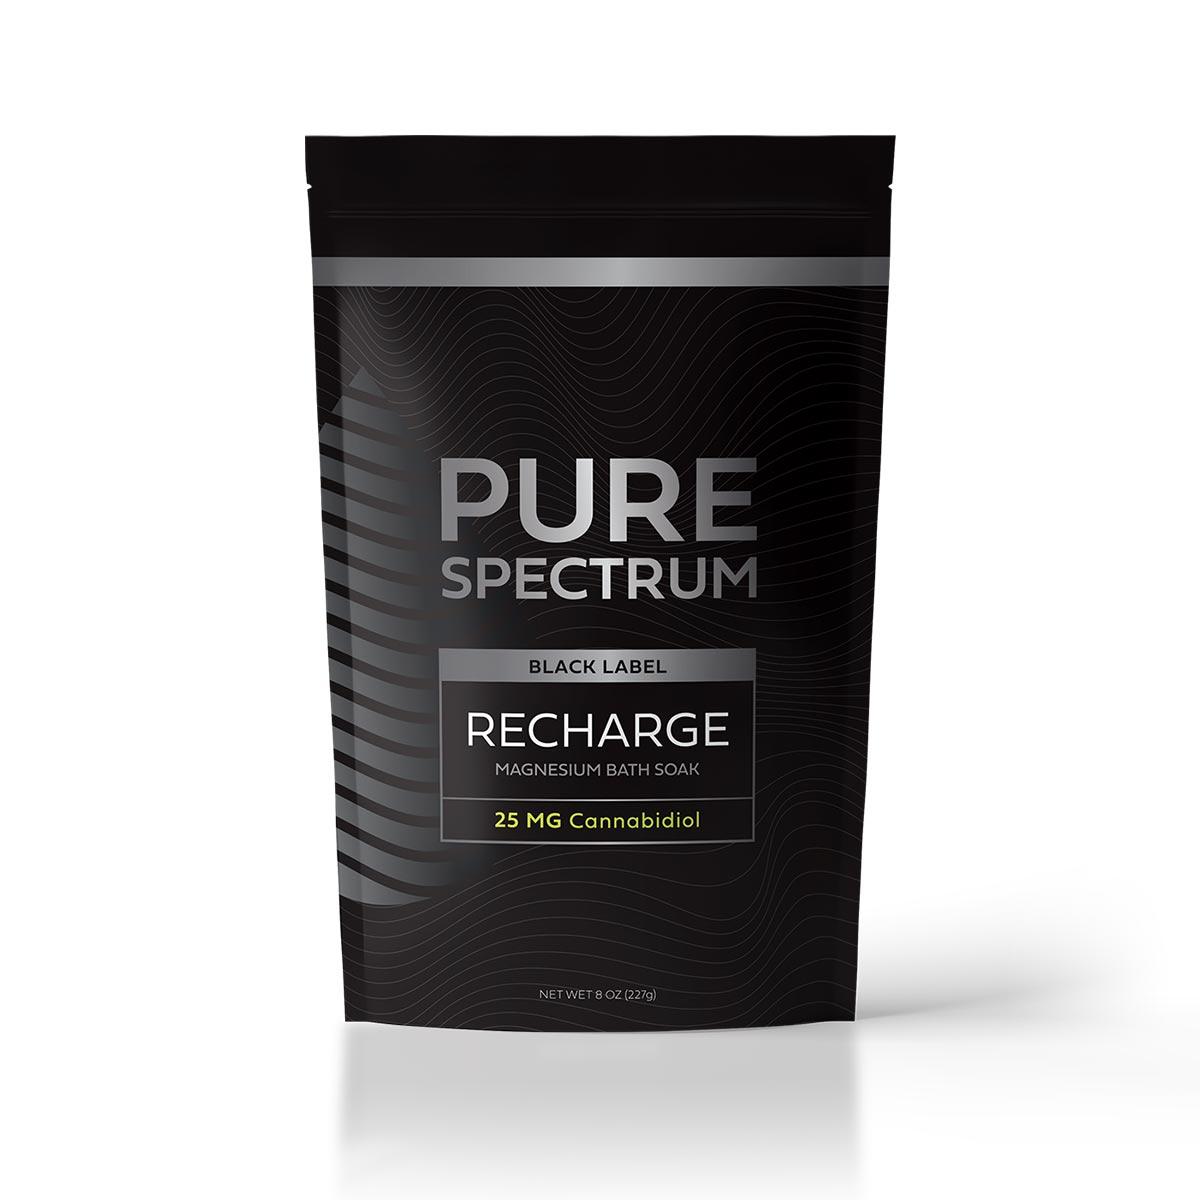 Pure Spectrum  Recharge Magnesium Bath Soak  8oz  25mg of CBD